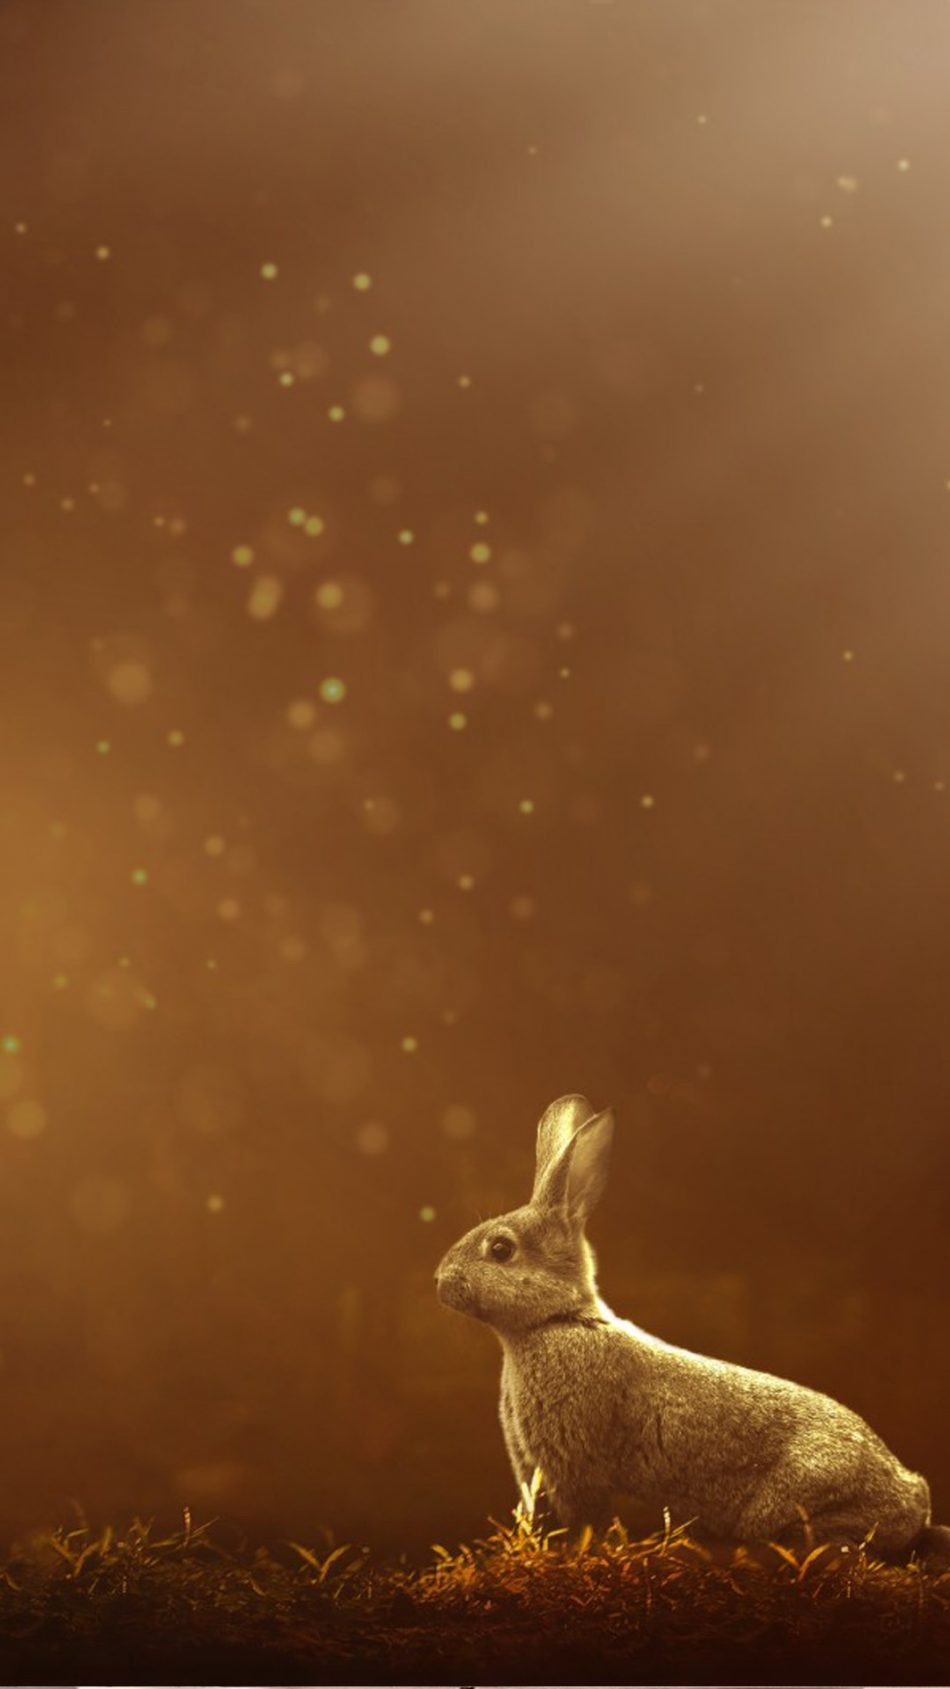 Rabbit Forest Sunlight HD Mobile Wallpaper